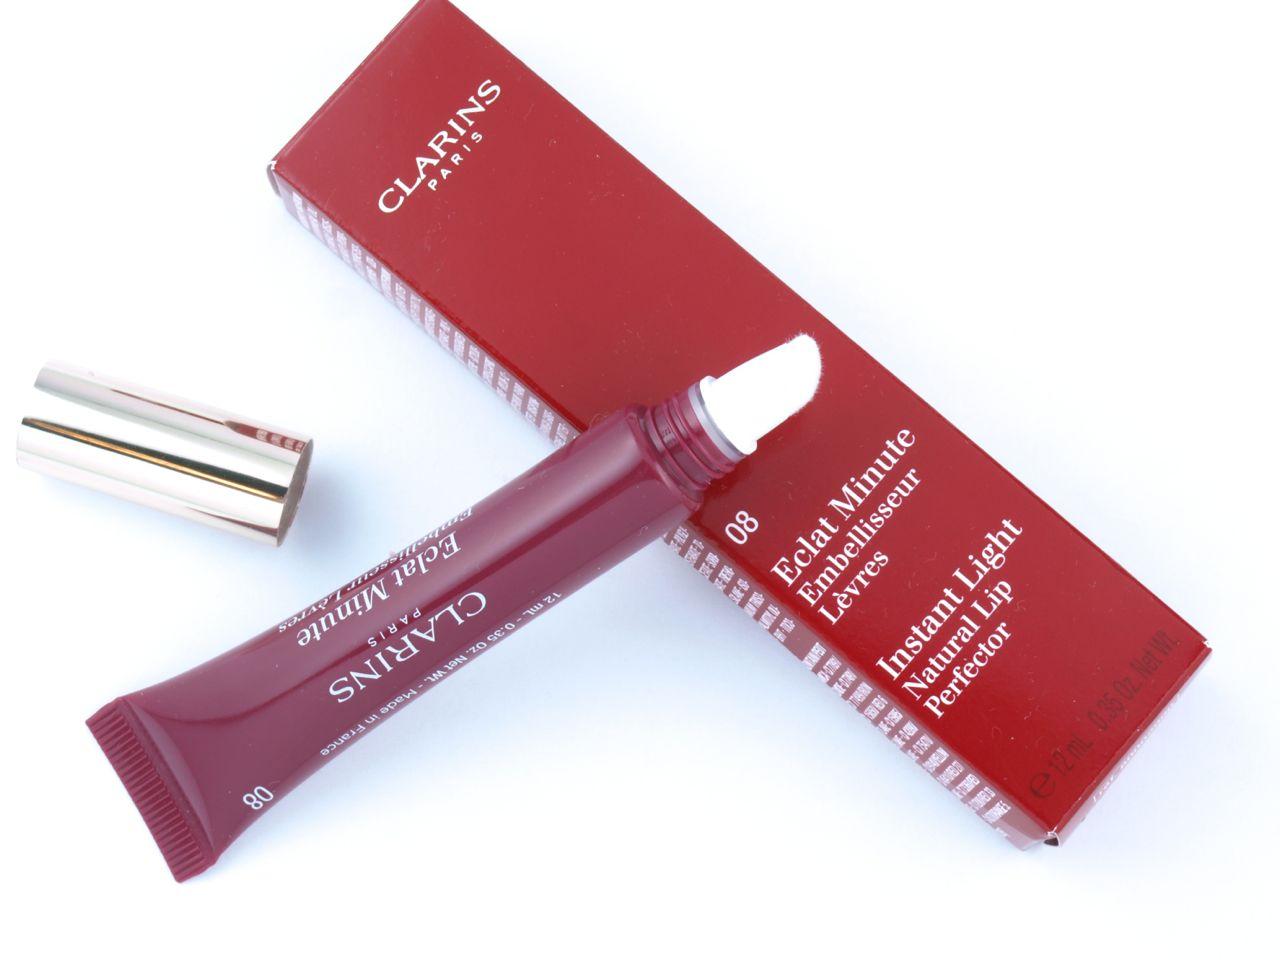 Clarins Lip Gloss Shade 08 Plum Shimmer